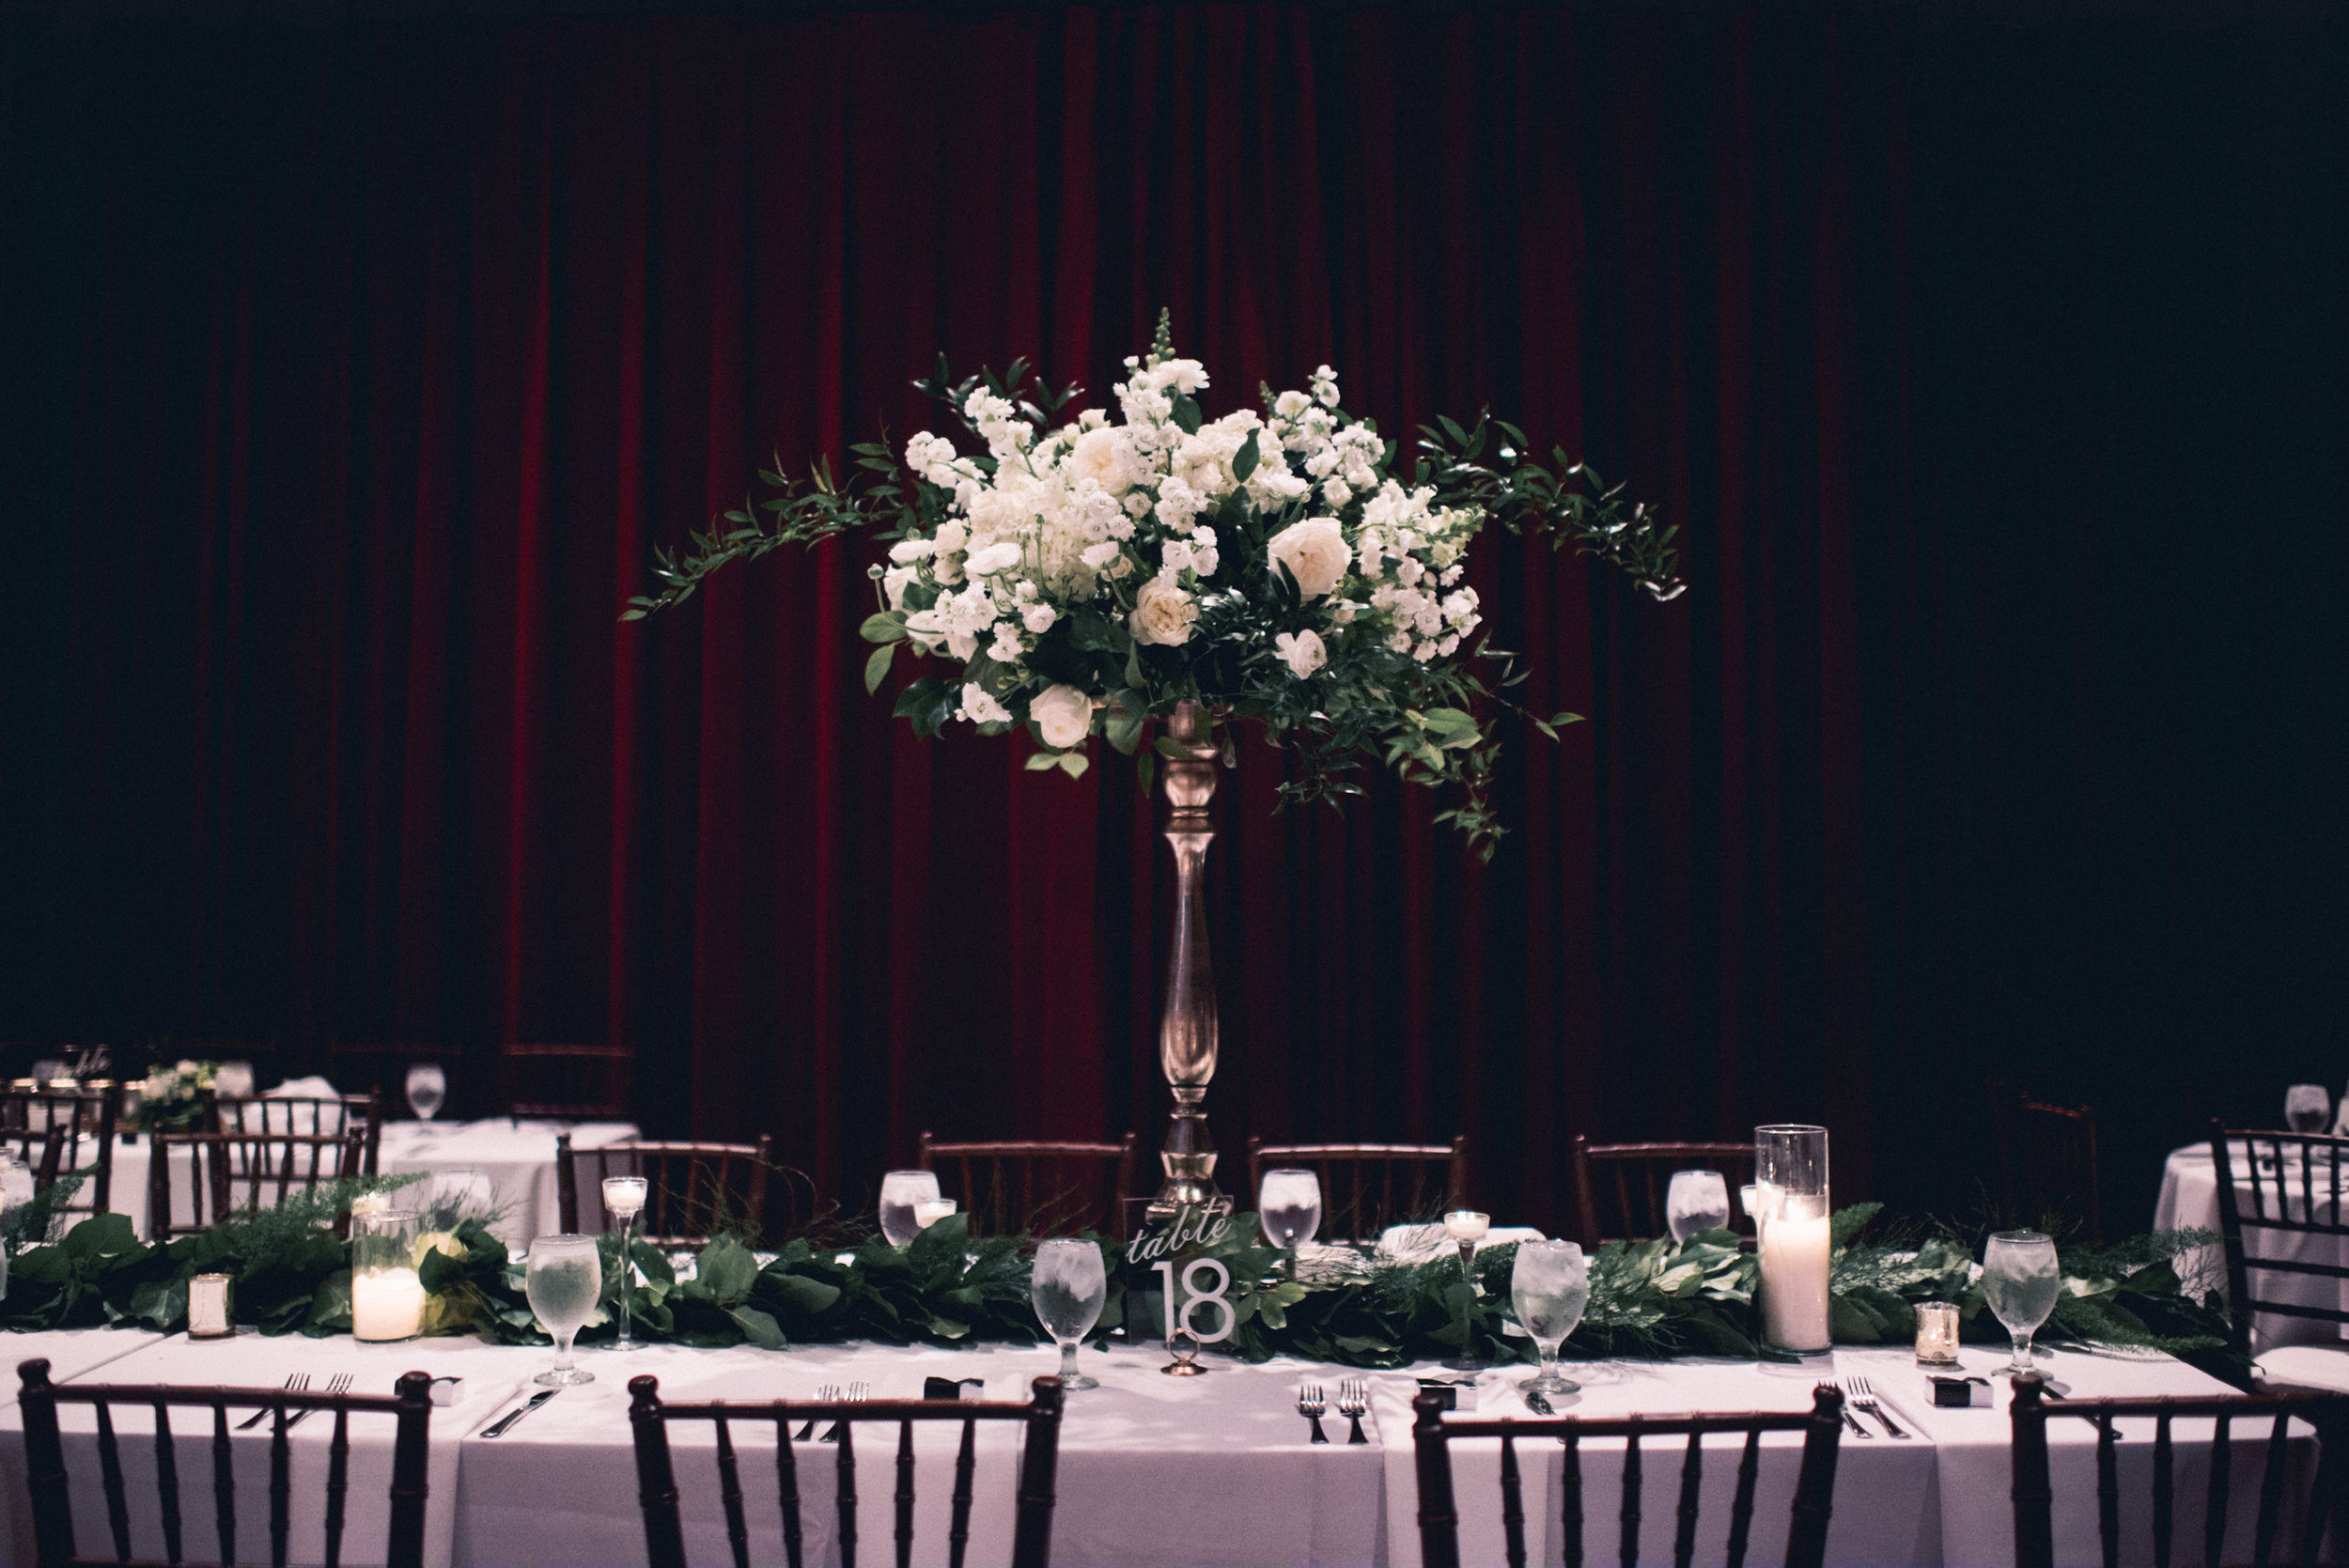 Pittsburgh Pennsylvania New York NYC Wedding Photographer Photojournalist Luxury Downtown Opera - Stirpe 1154.jpg